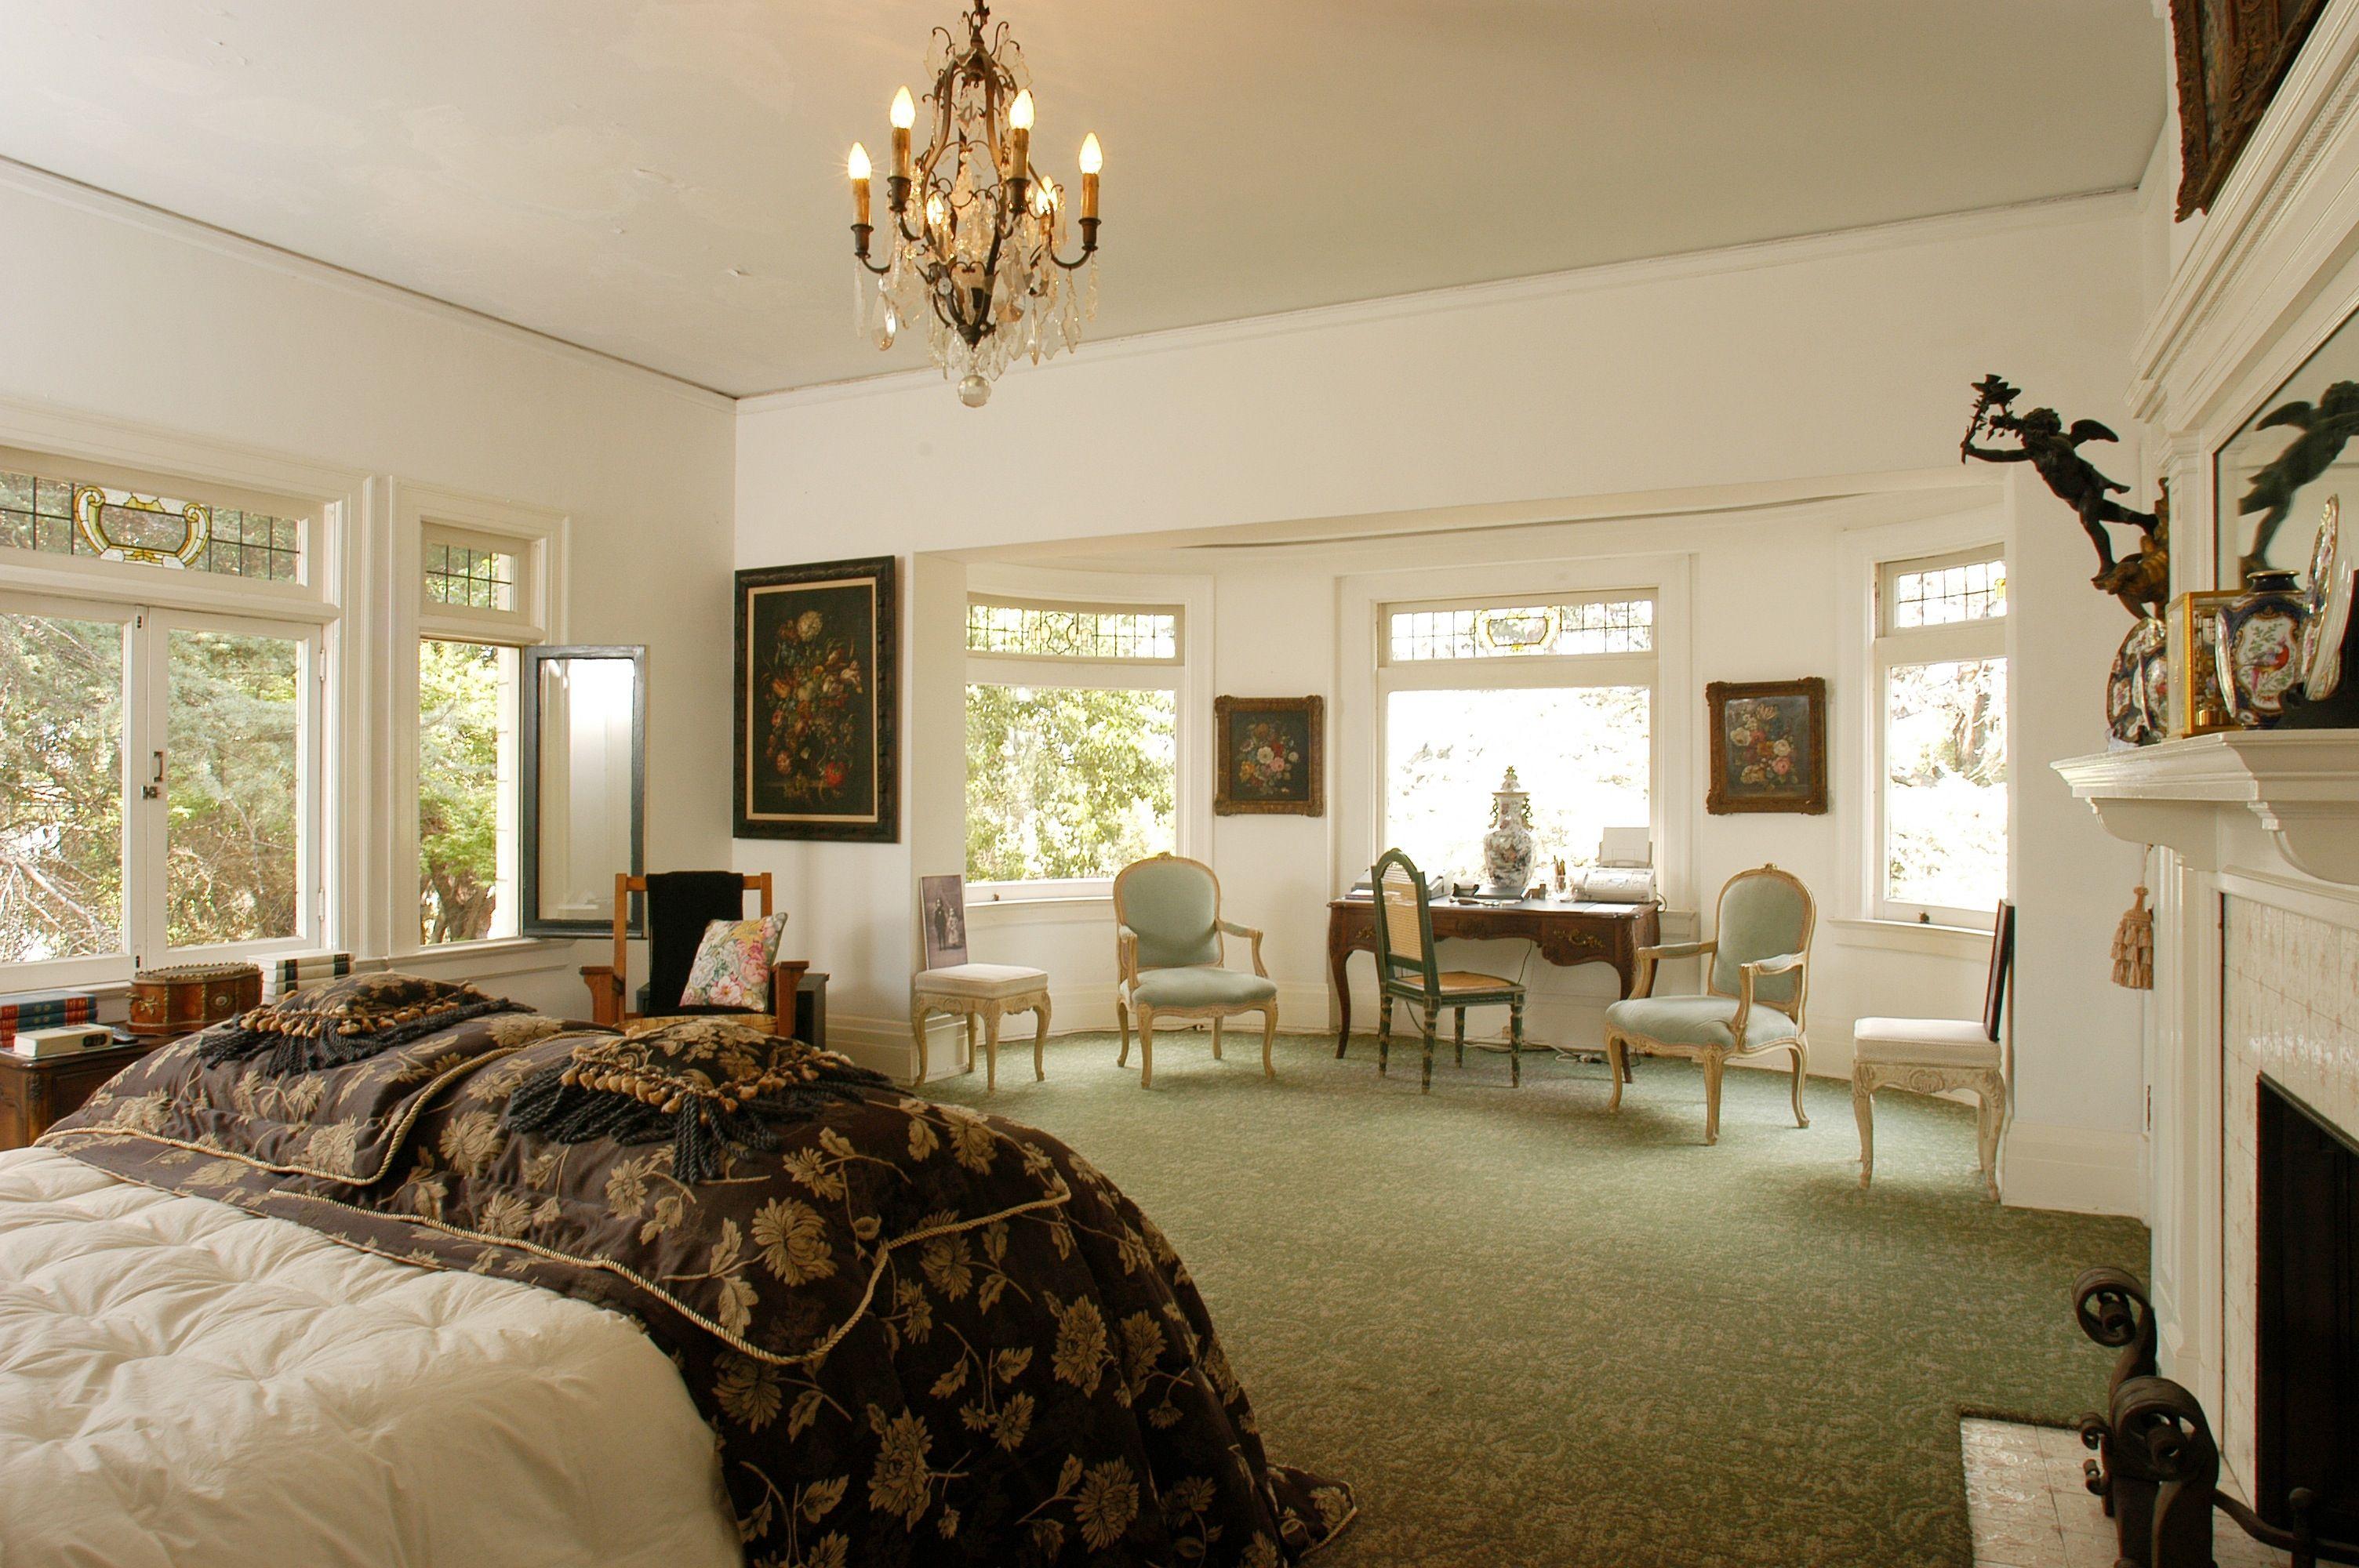 American Horror Story Bedroom Decor   Bedroom Decor   Pinterest ...